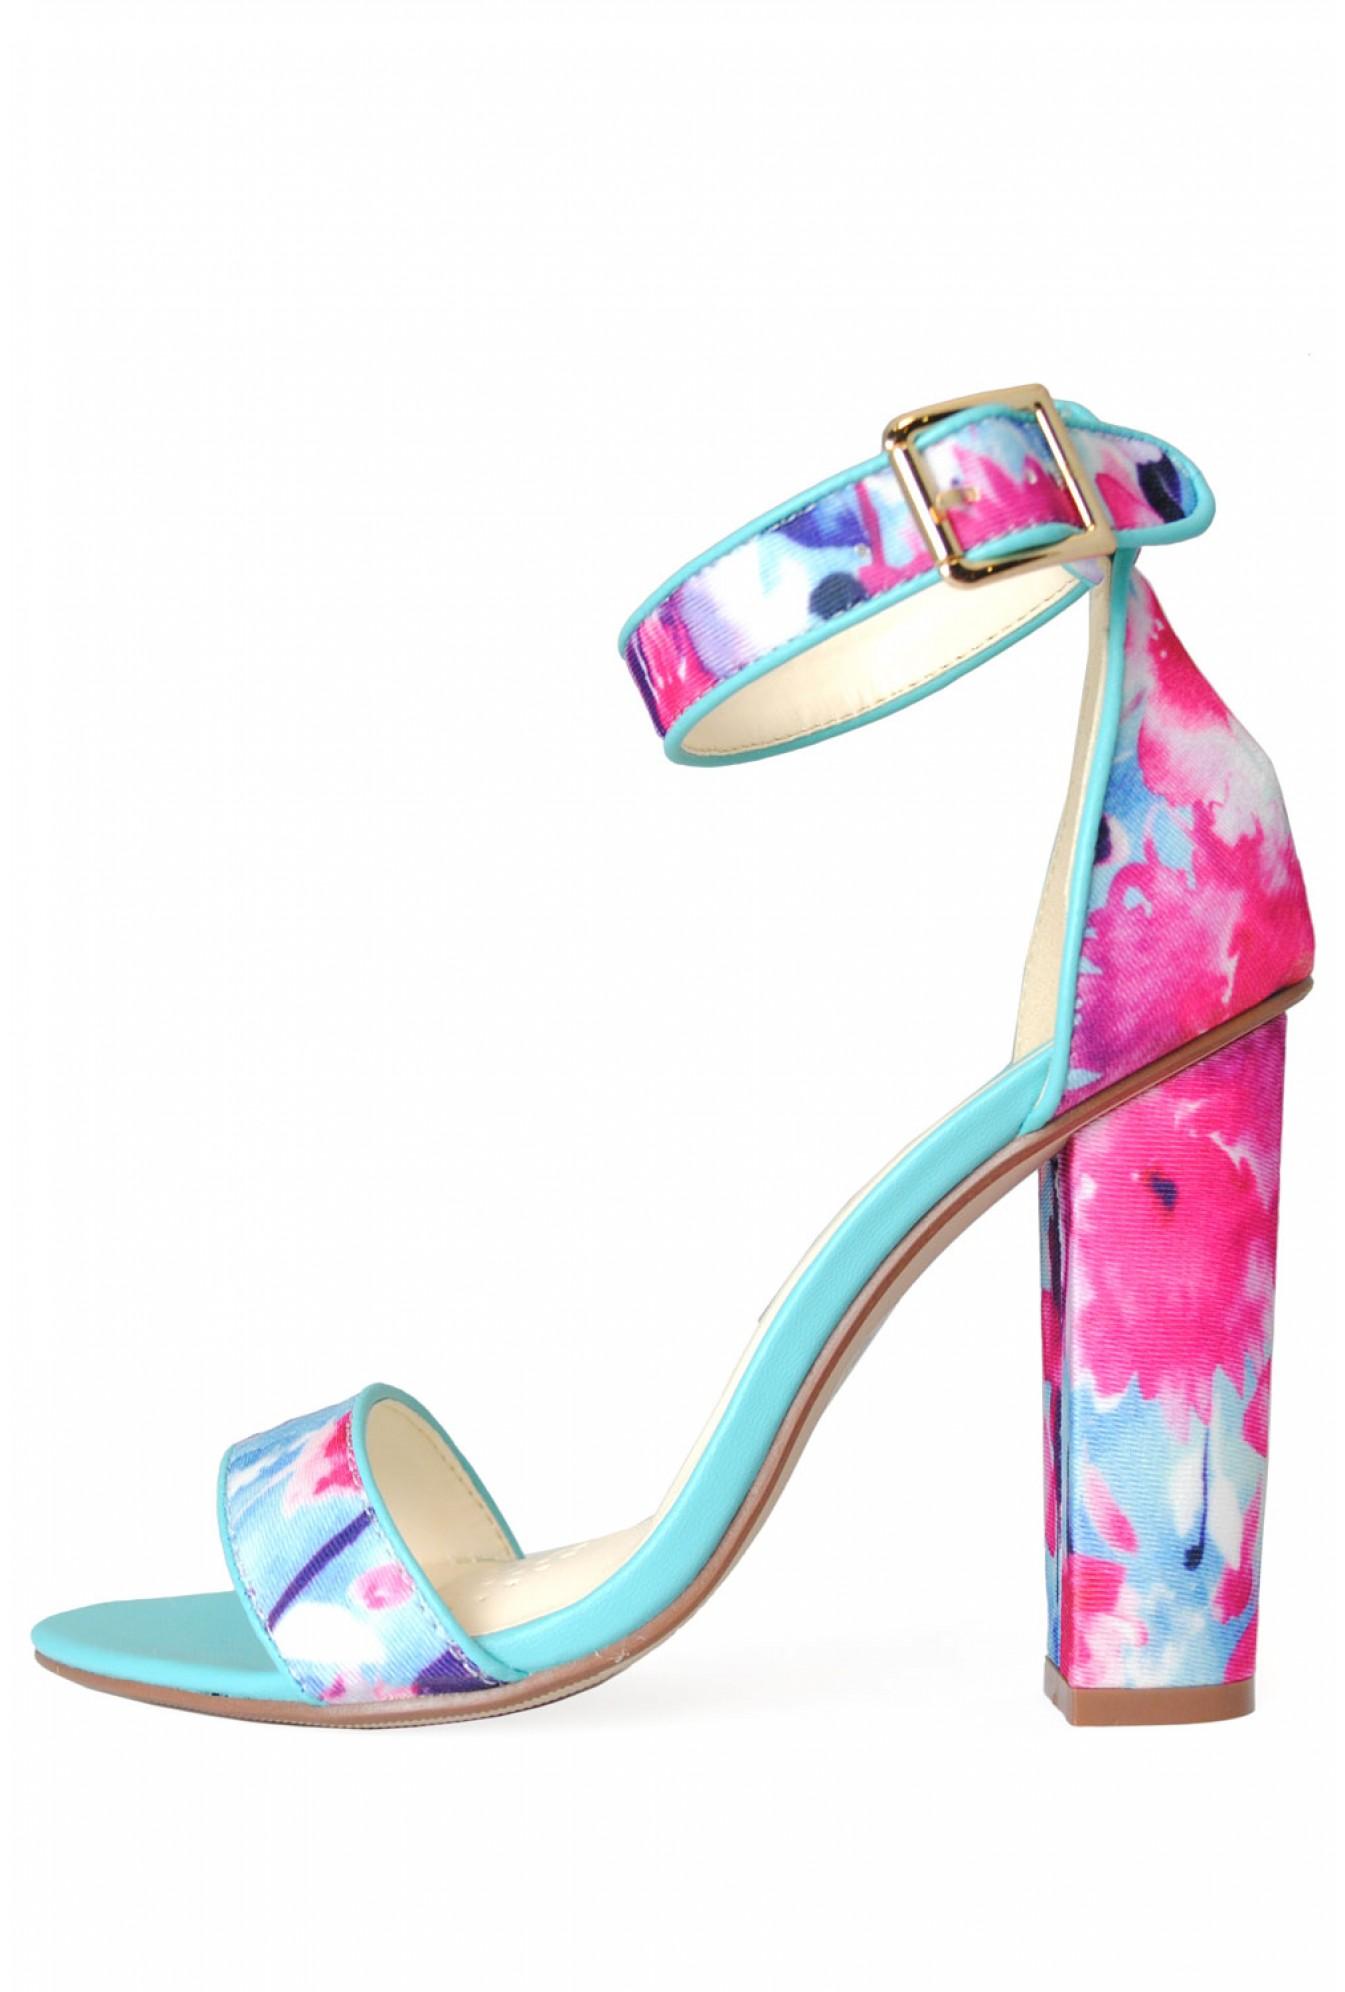 ff8cf42d830 C M Paris Alanis Floral Block Heel Sandal in Blue